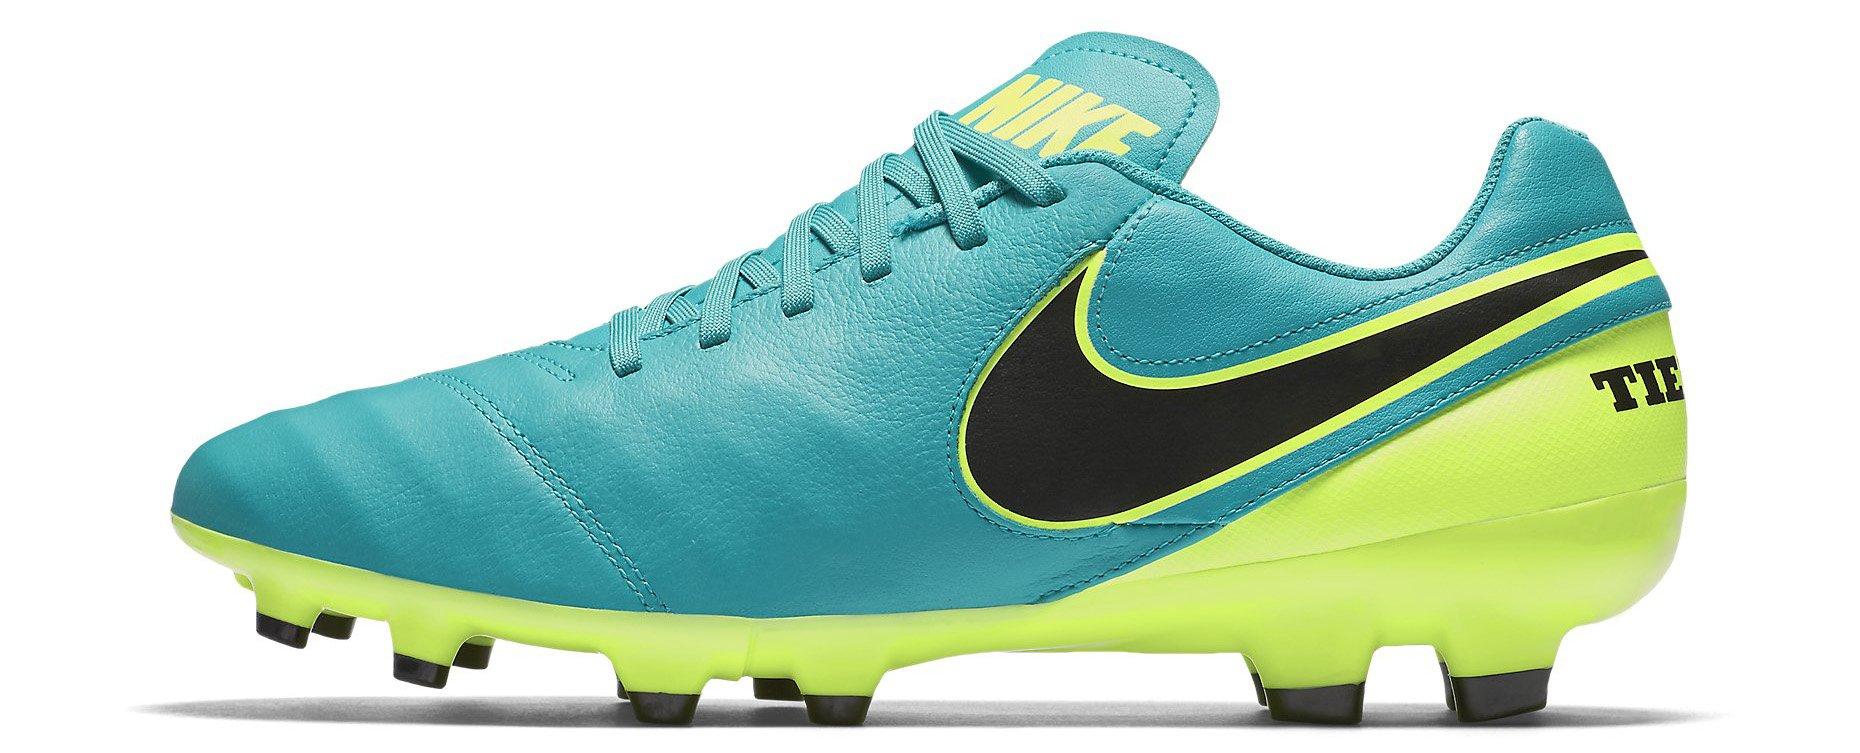 Kopačky Nike Tiempo Genio Leather FG